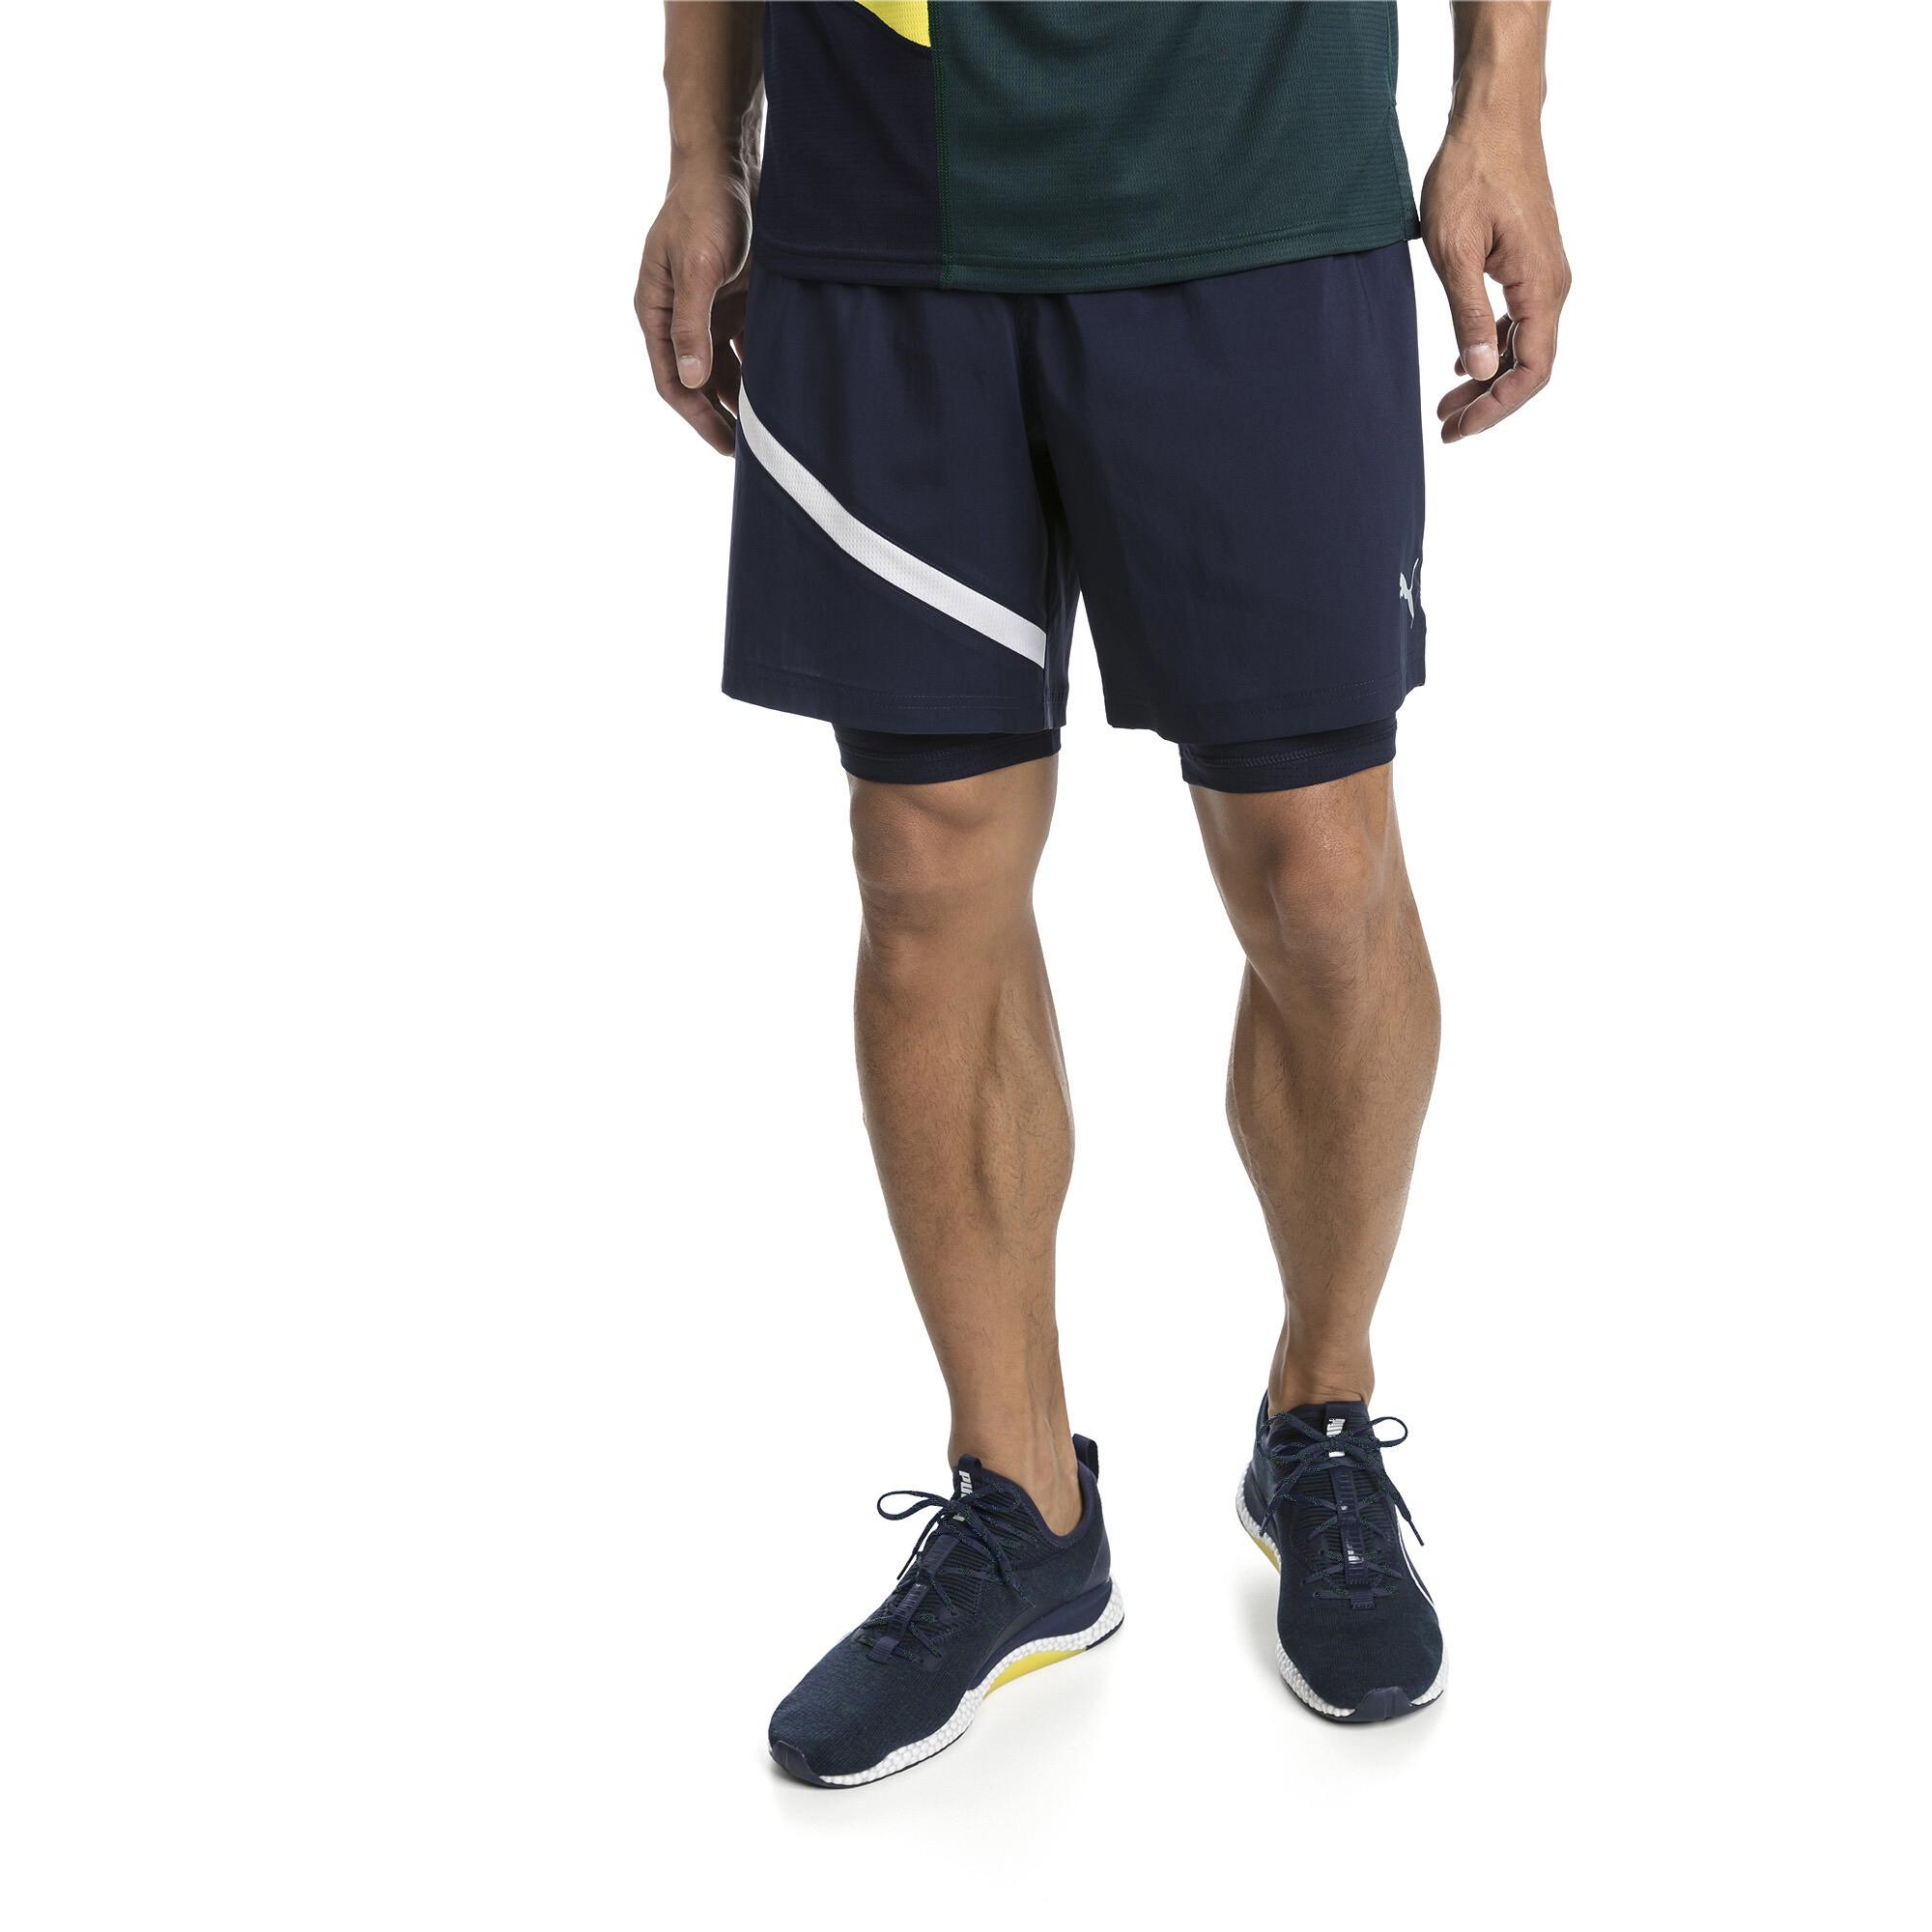 Image Puma Ignite Woven 2 in 1 Men's Running Shorts #1